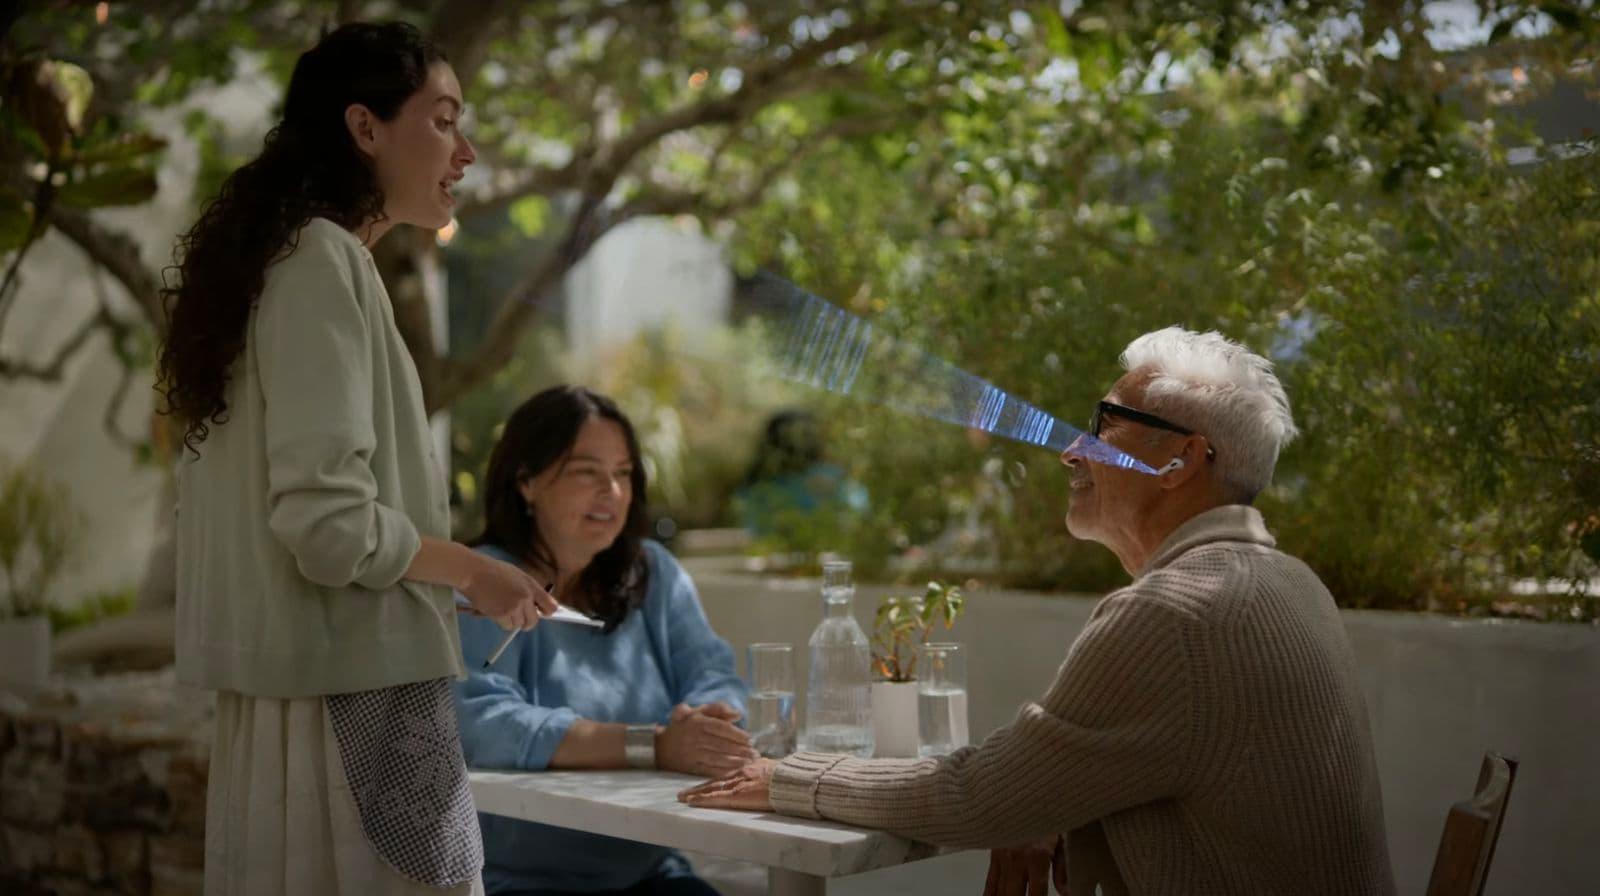 AirPods 對話增強是什麼